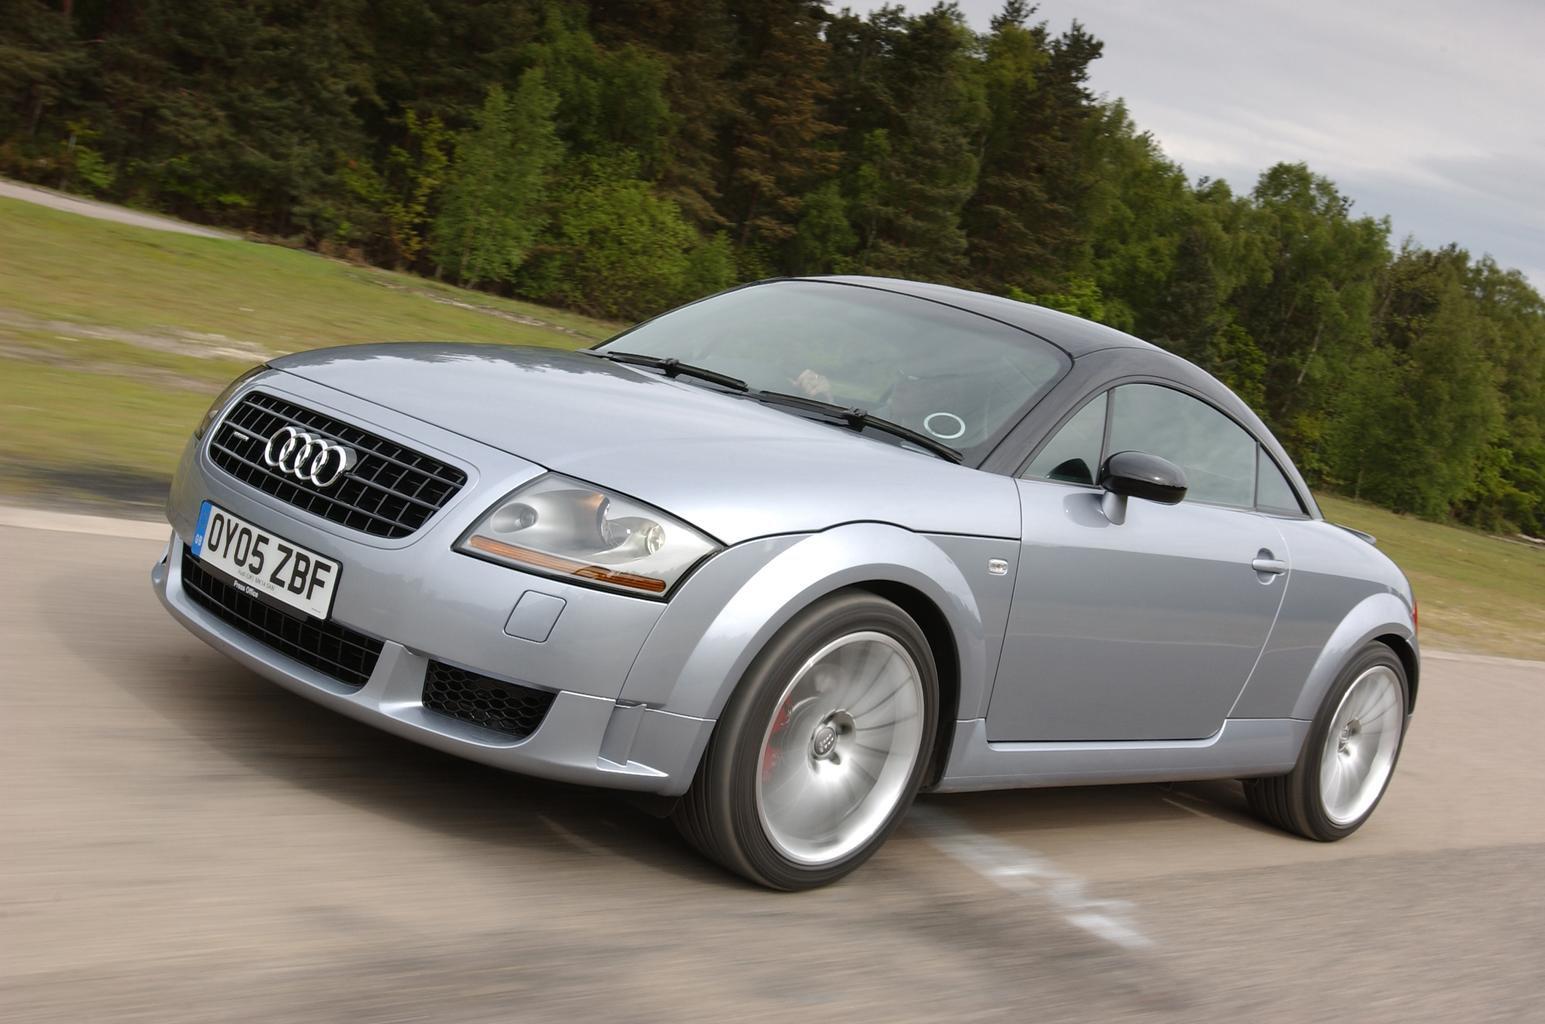 Tuto-demontage-et-nettoyage-boitier-papillon-sur-Audi-TT-Mk1-1.jpg